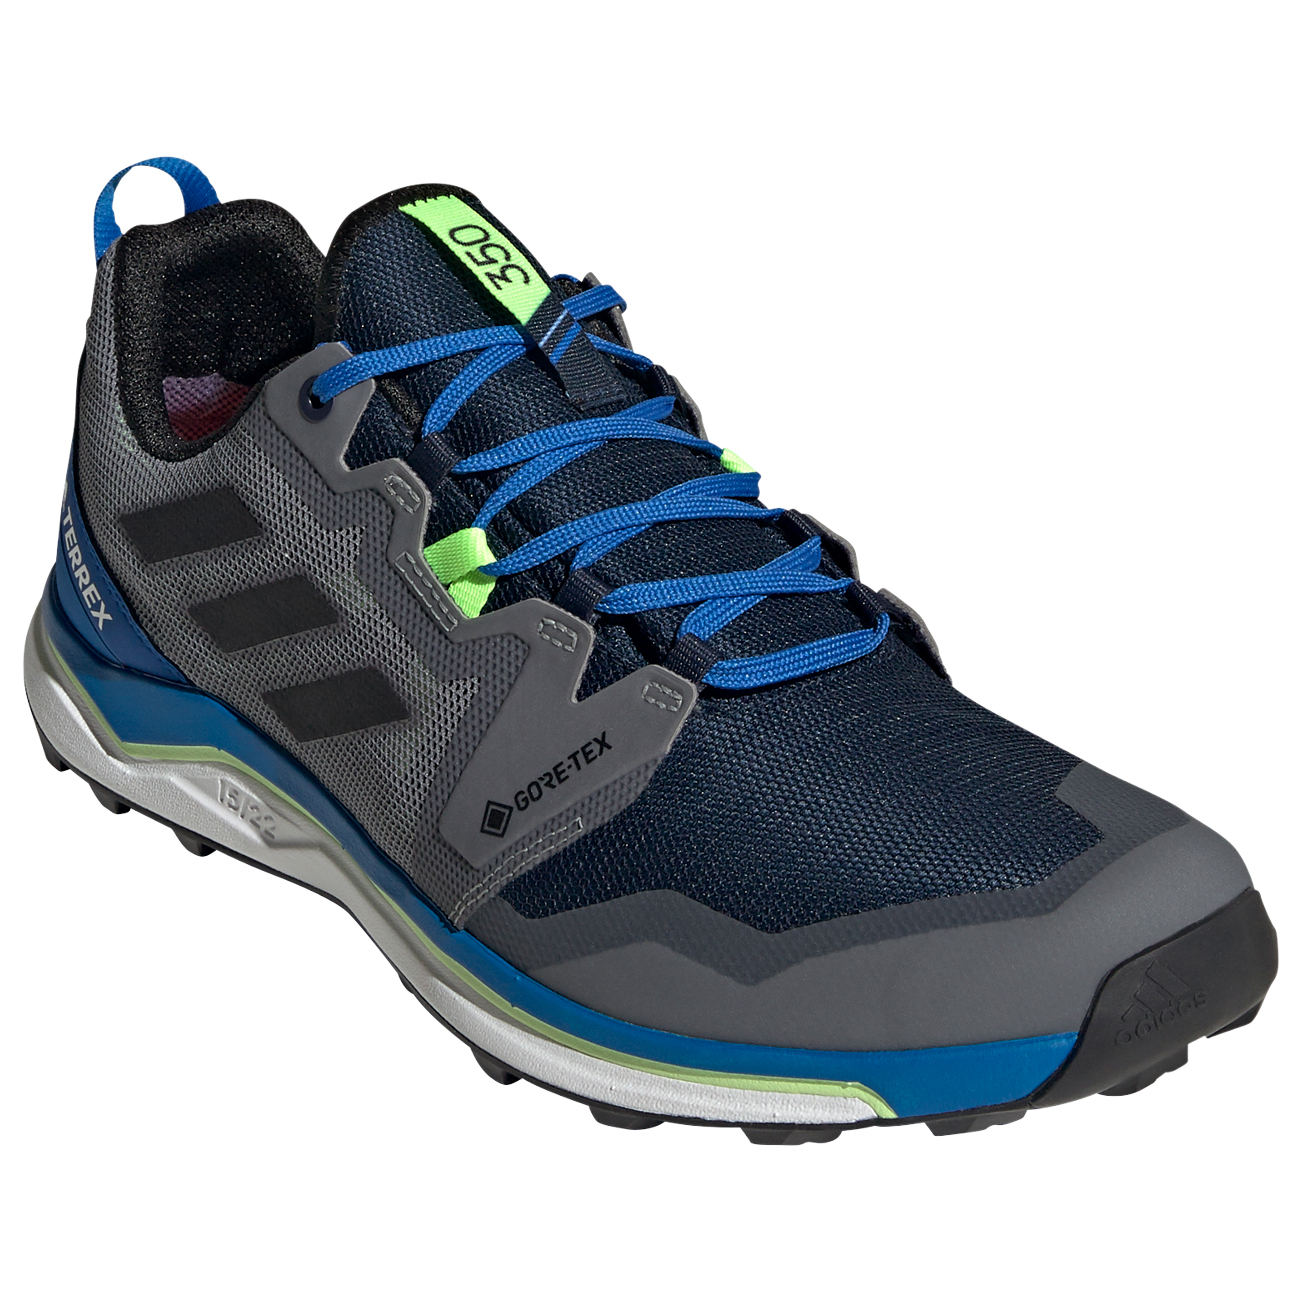 tinción Monopolio Lujo  Adidas Terrex Agravic GTX - Trail running shoes Men's | Free EU Delivery |  Bergfreunde.eu